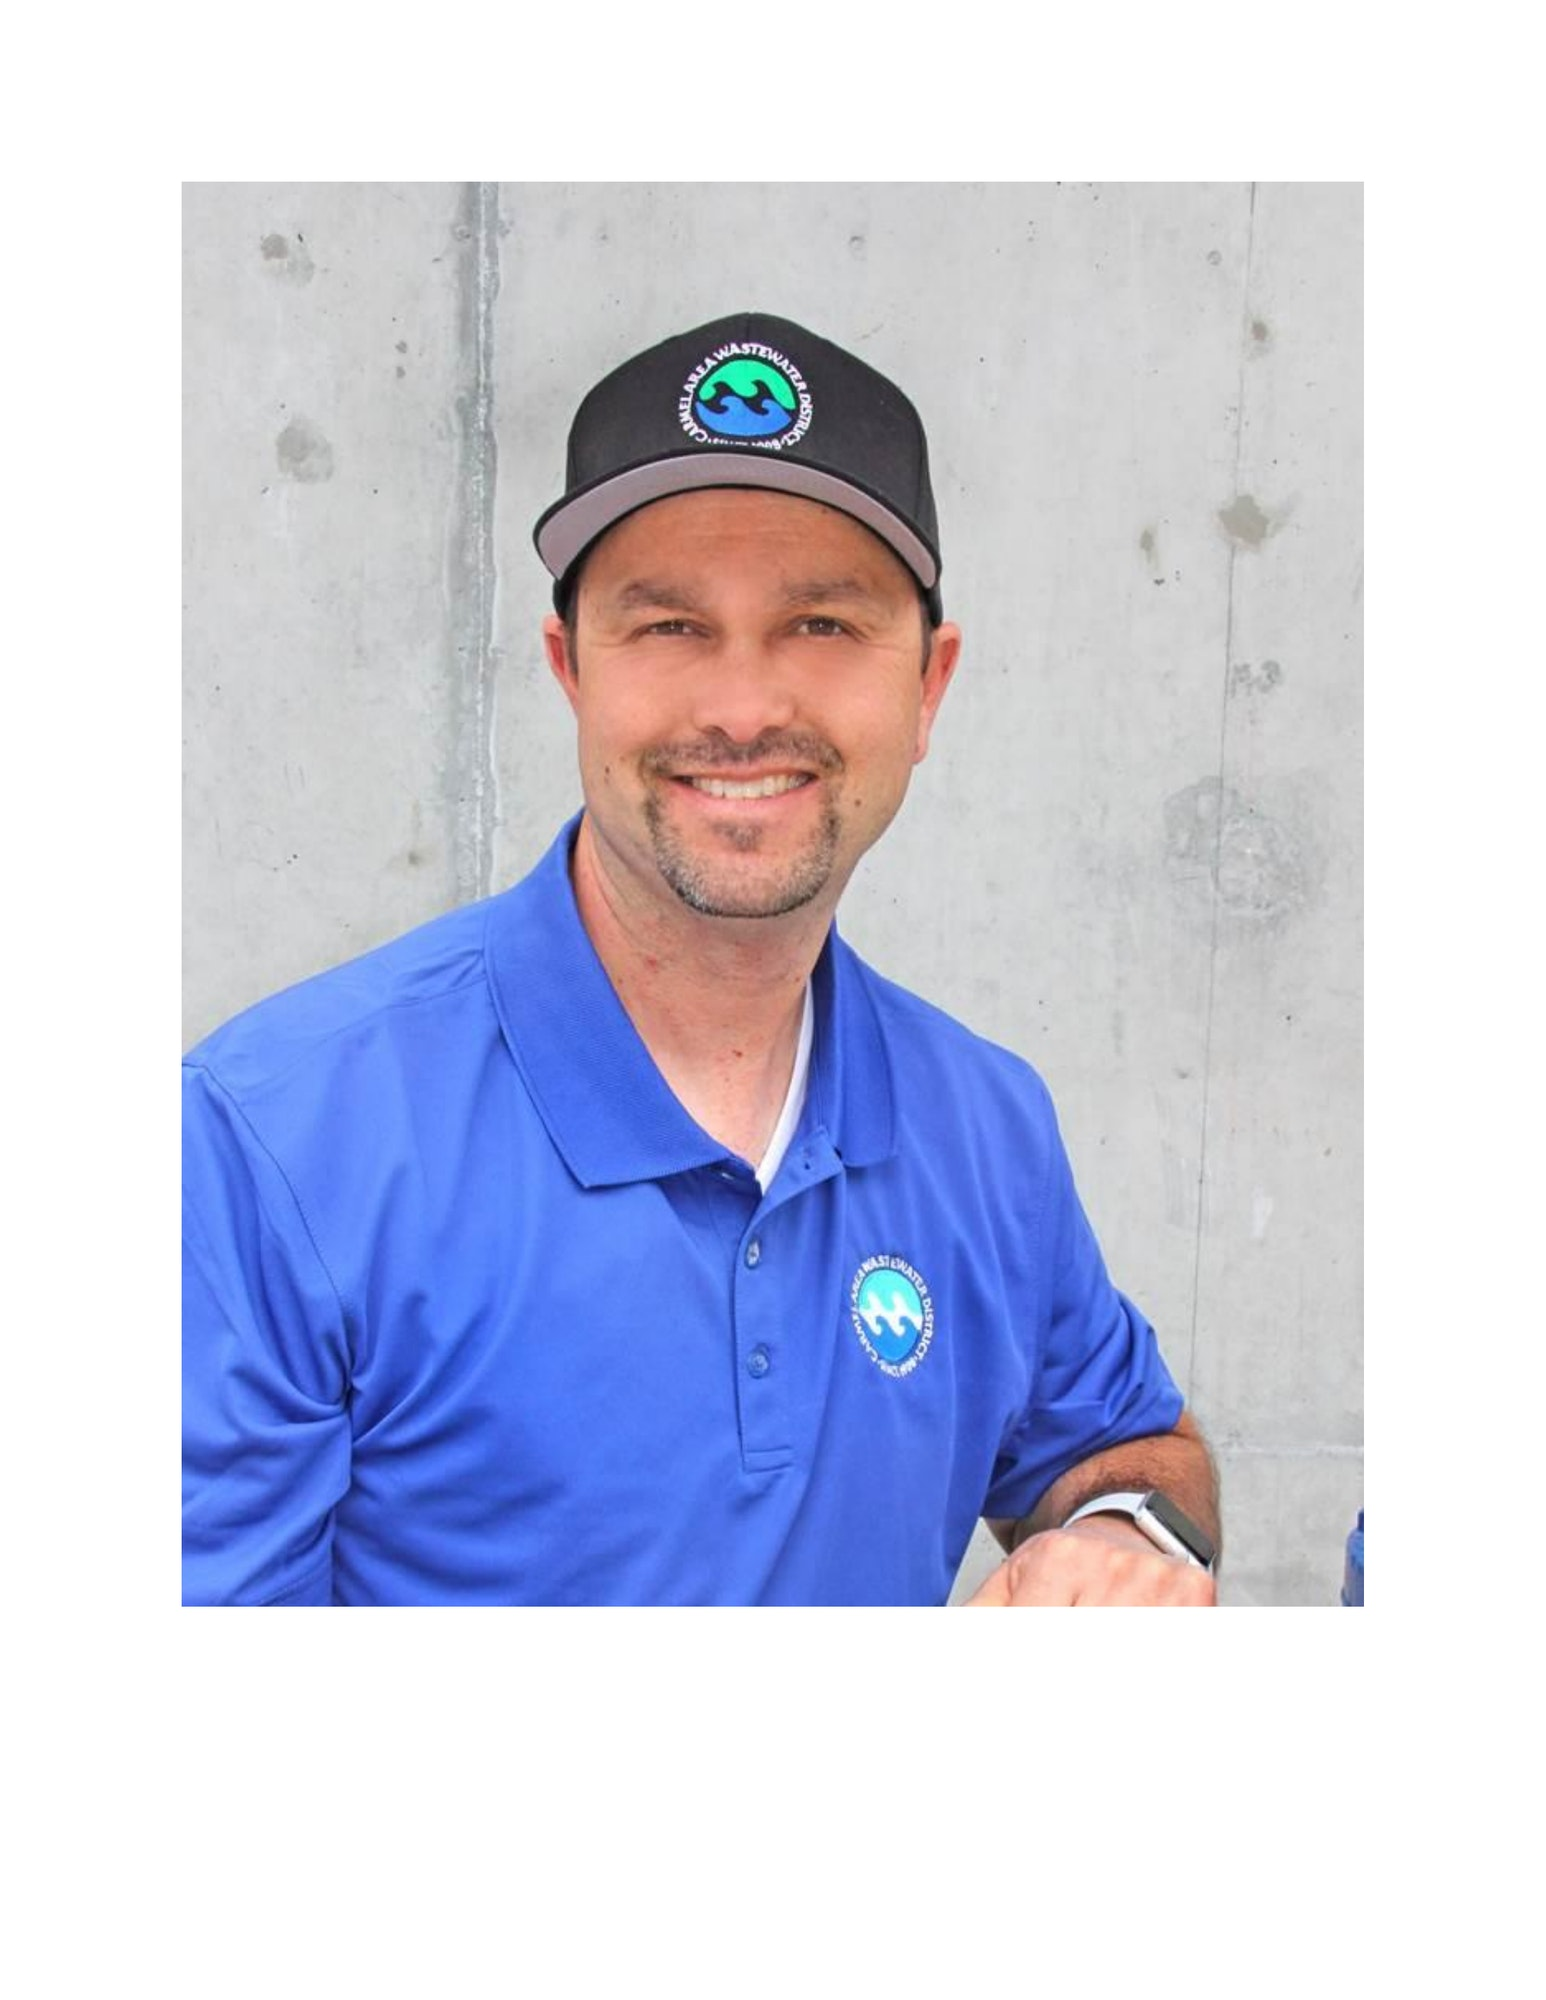 Chris Foley -Maintenance Superintendent